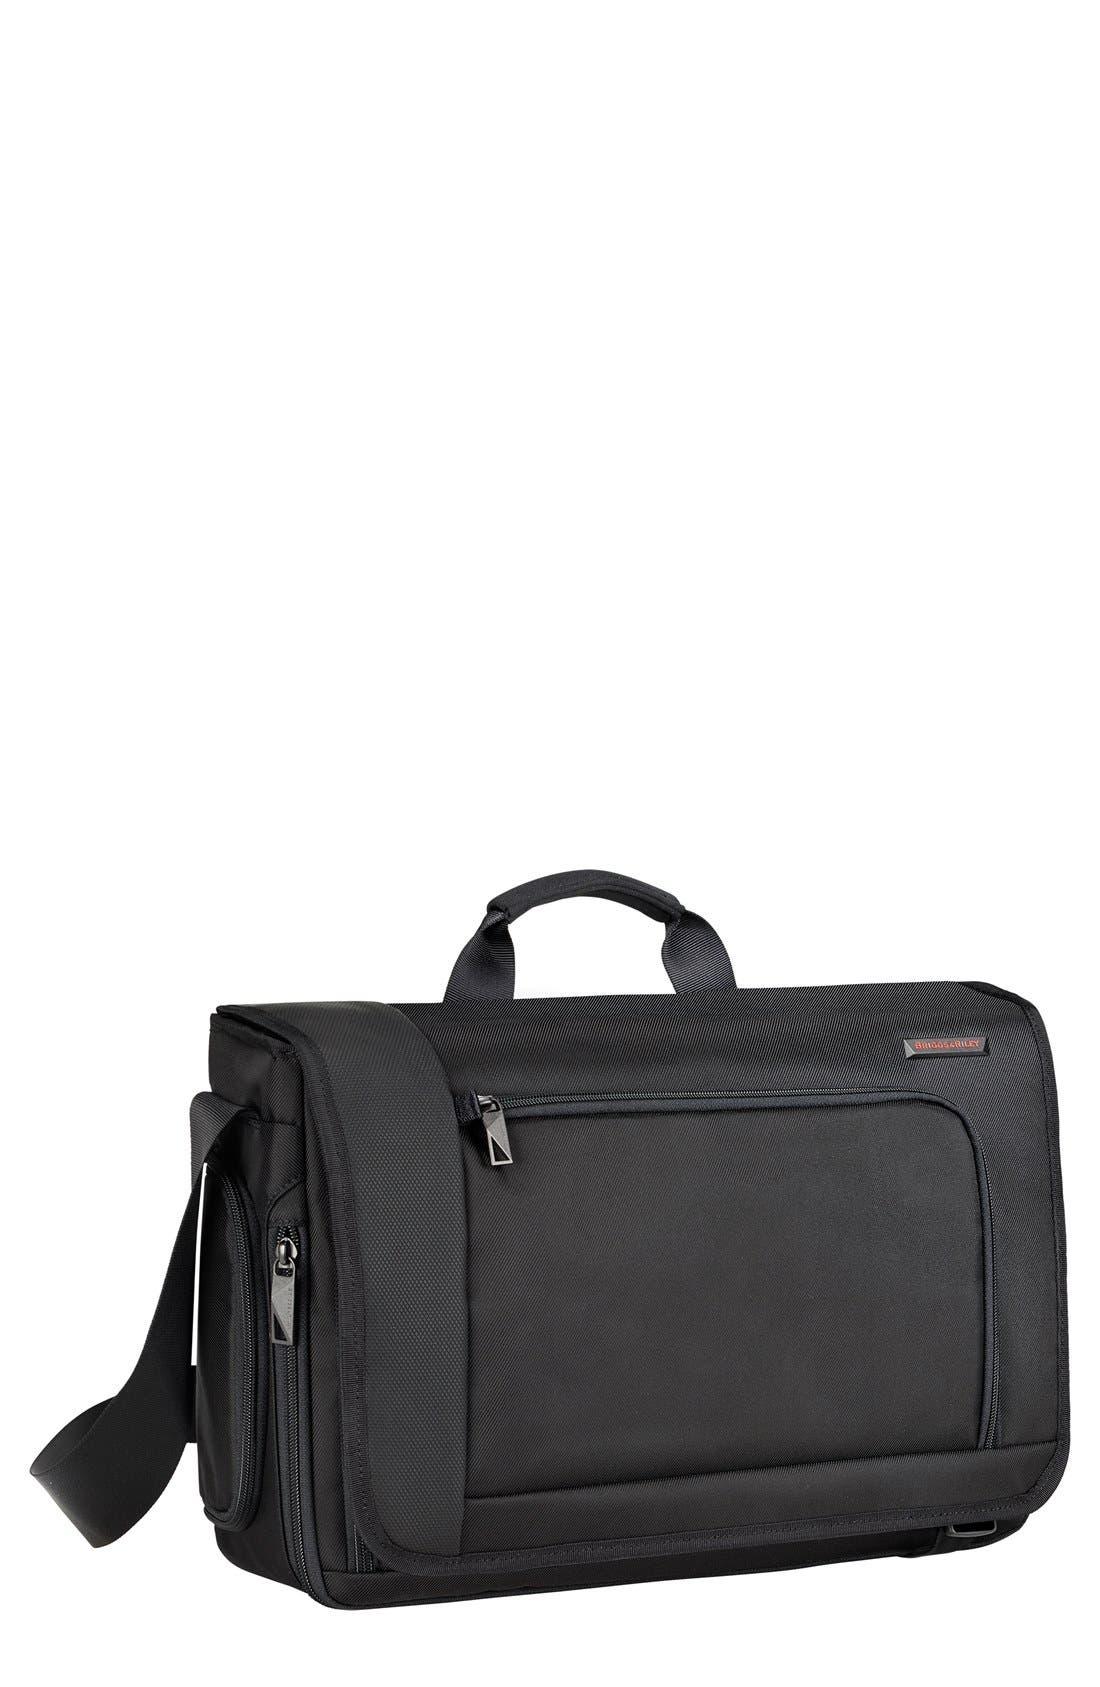 BRIGGS & RILEY 'Verb - Dispatch' Messenger Bag, Main, color, BLACK